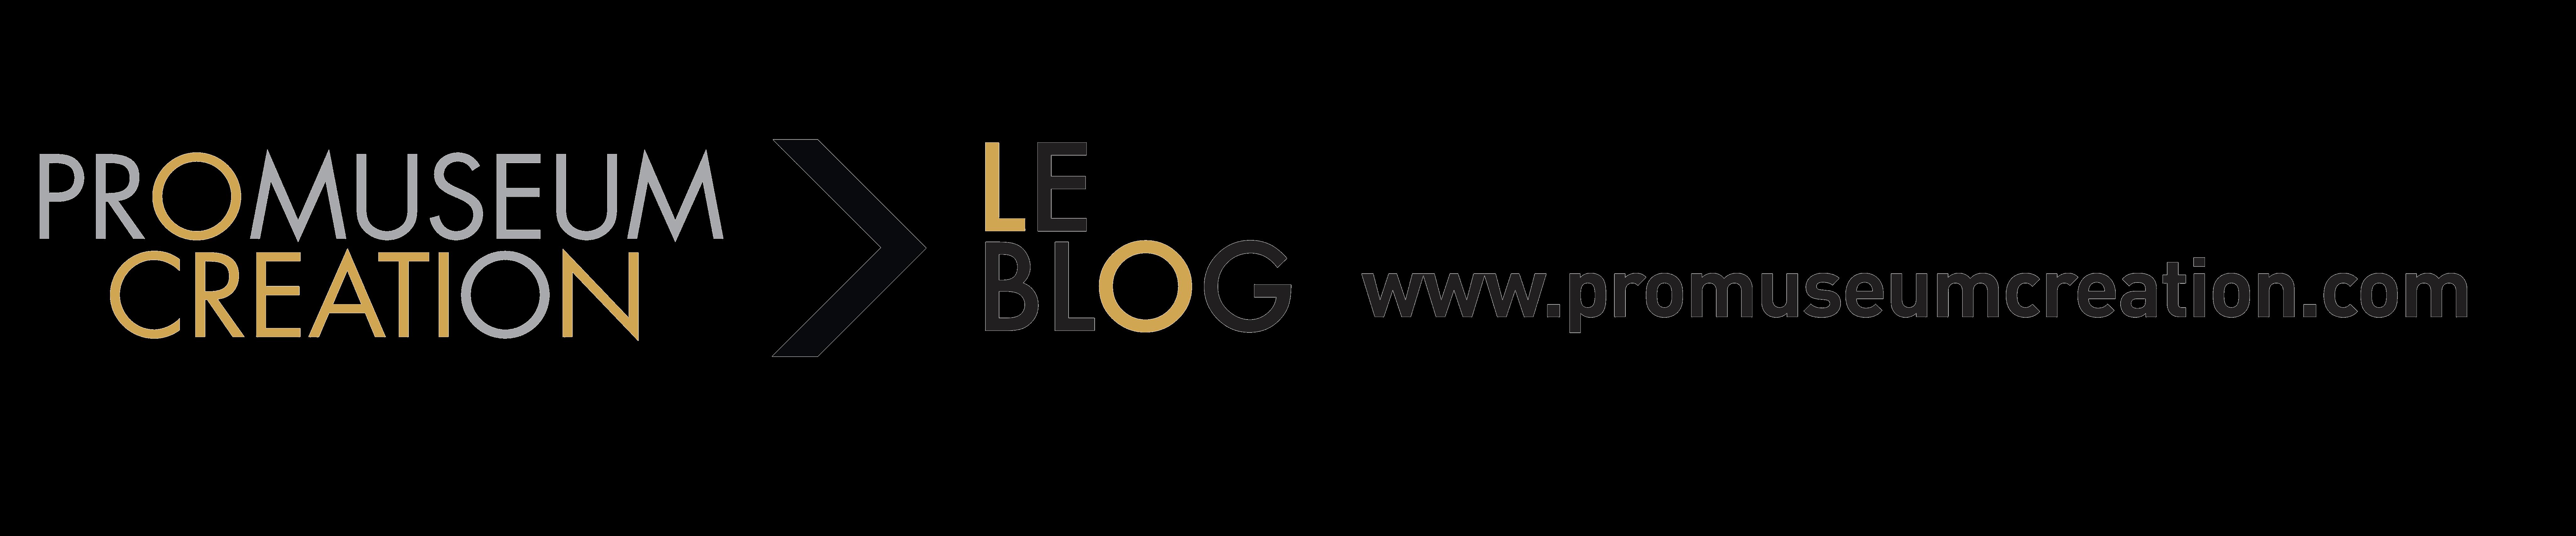 Blog Promuseum